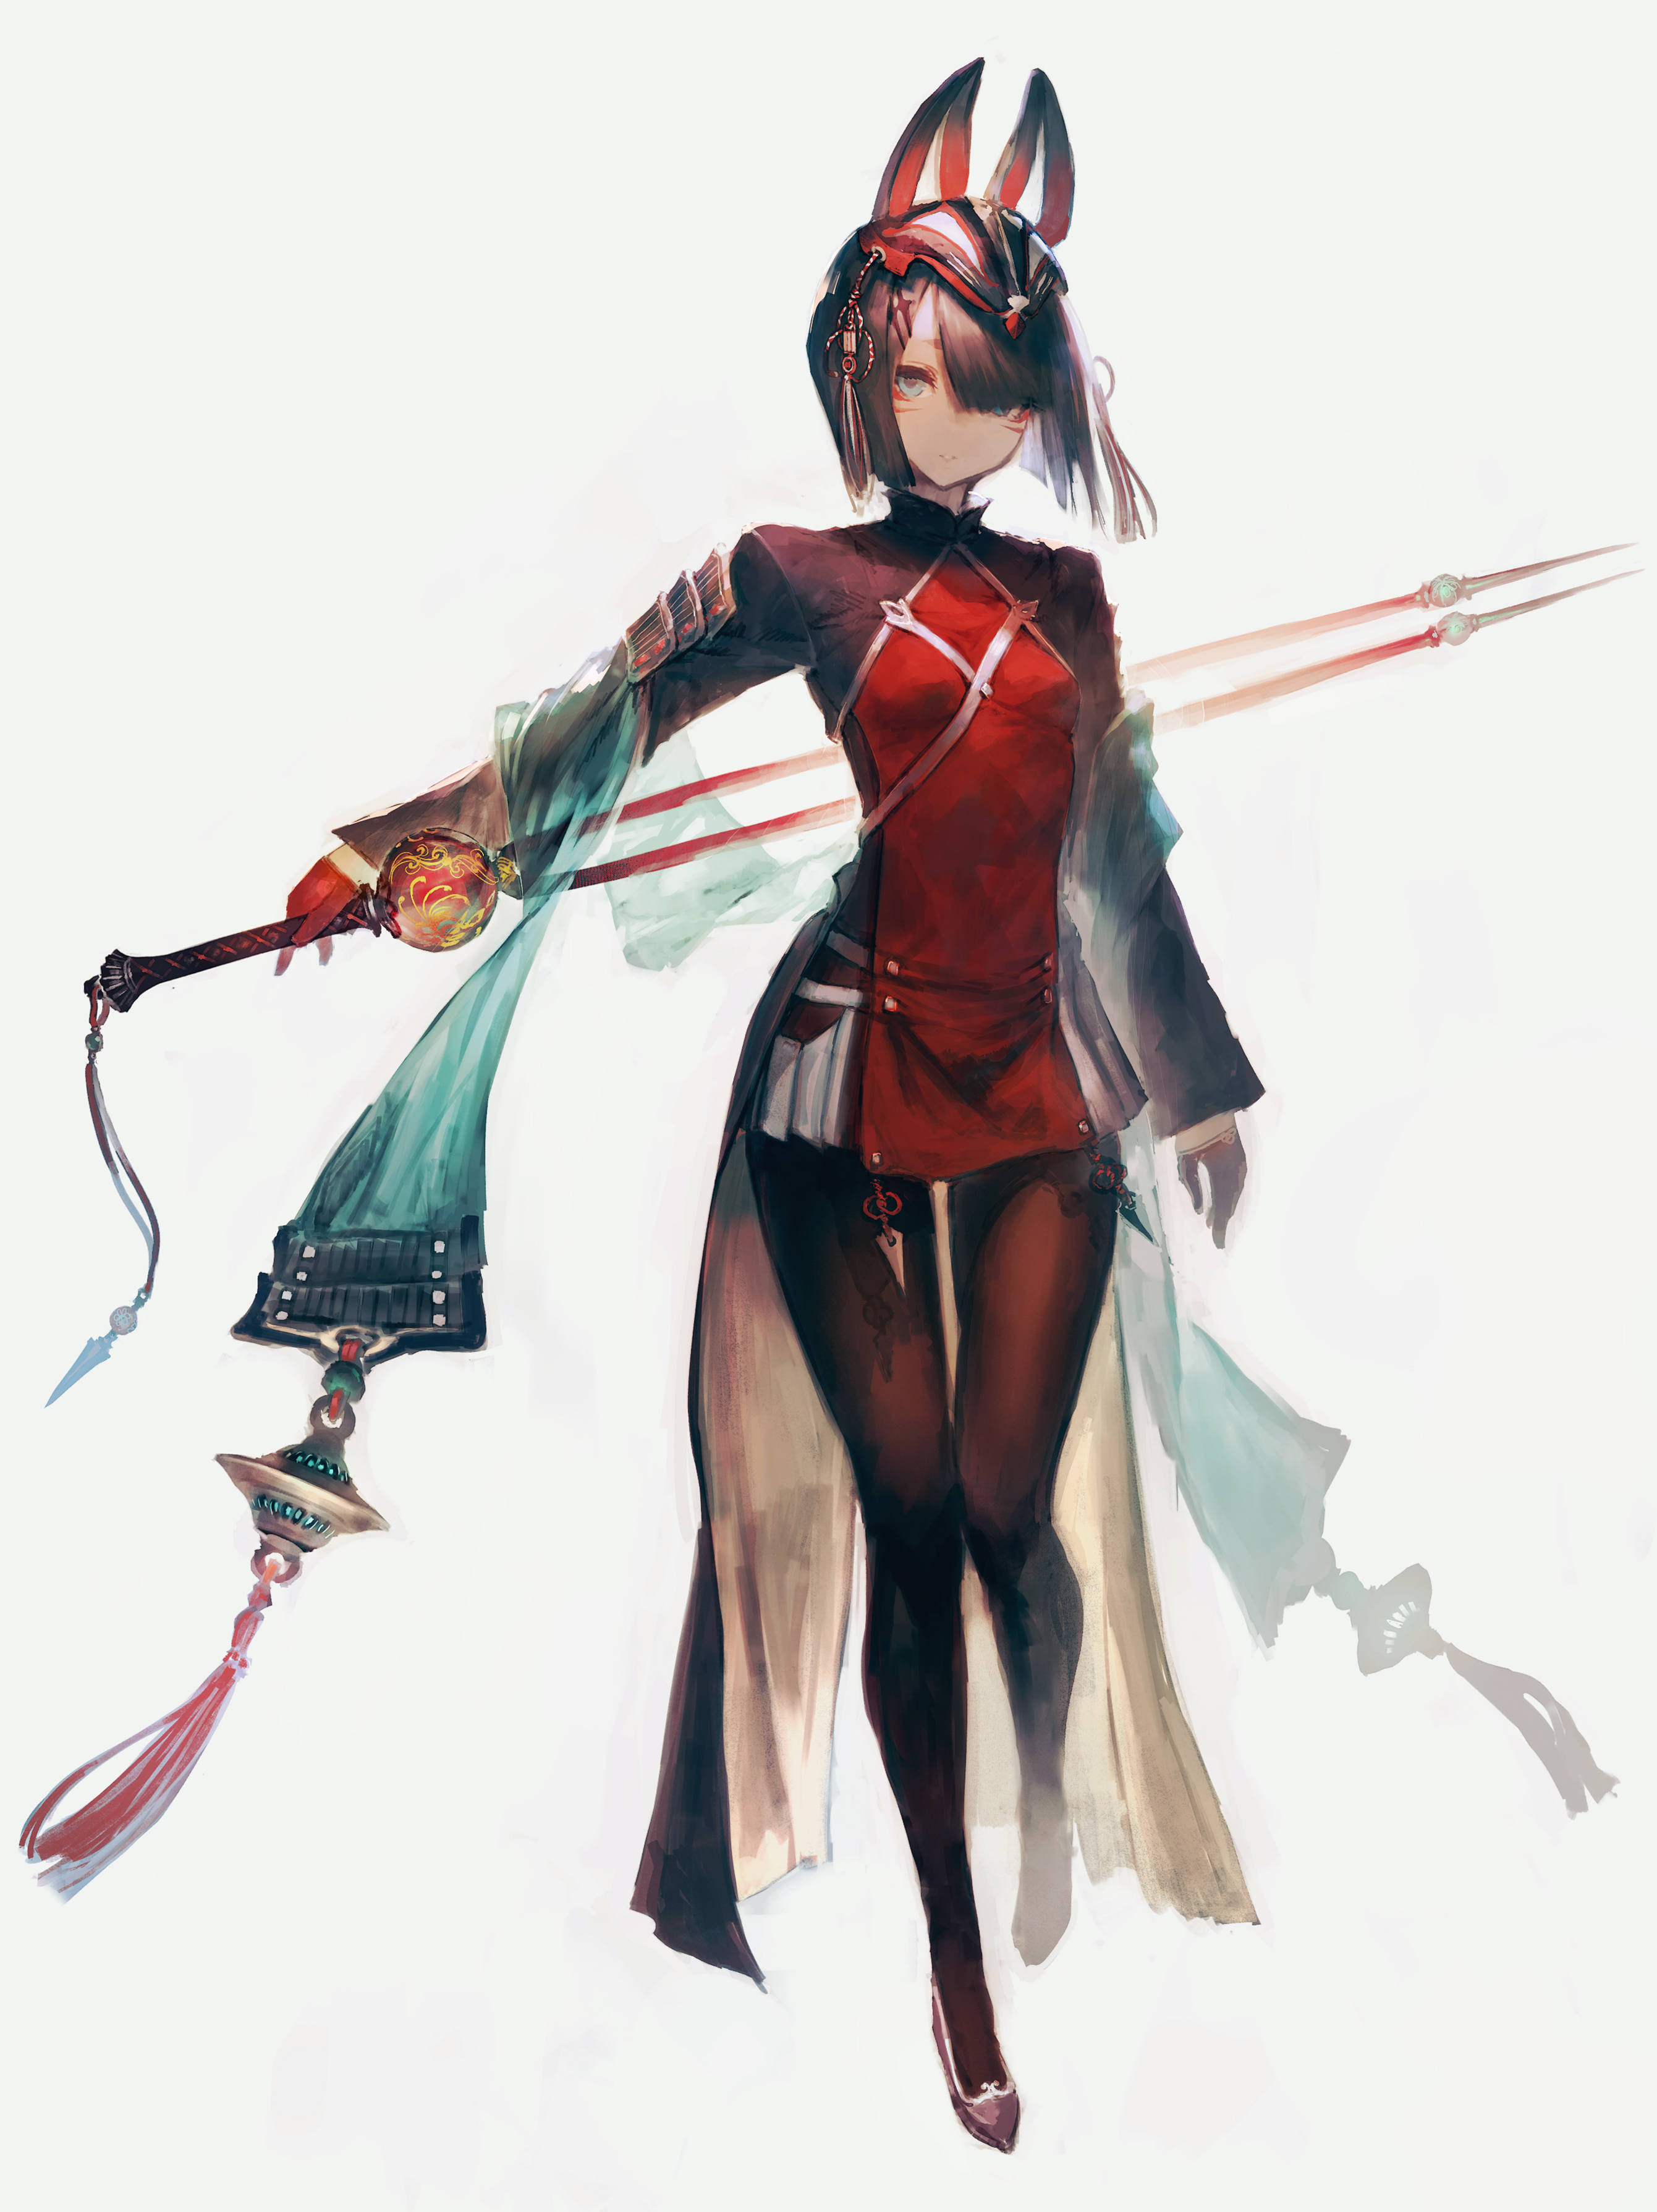 https://static.zerochan.net/Garuku.full.2156946.jpg